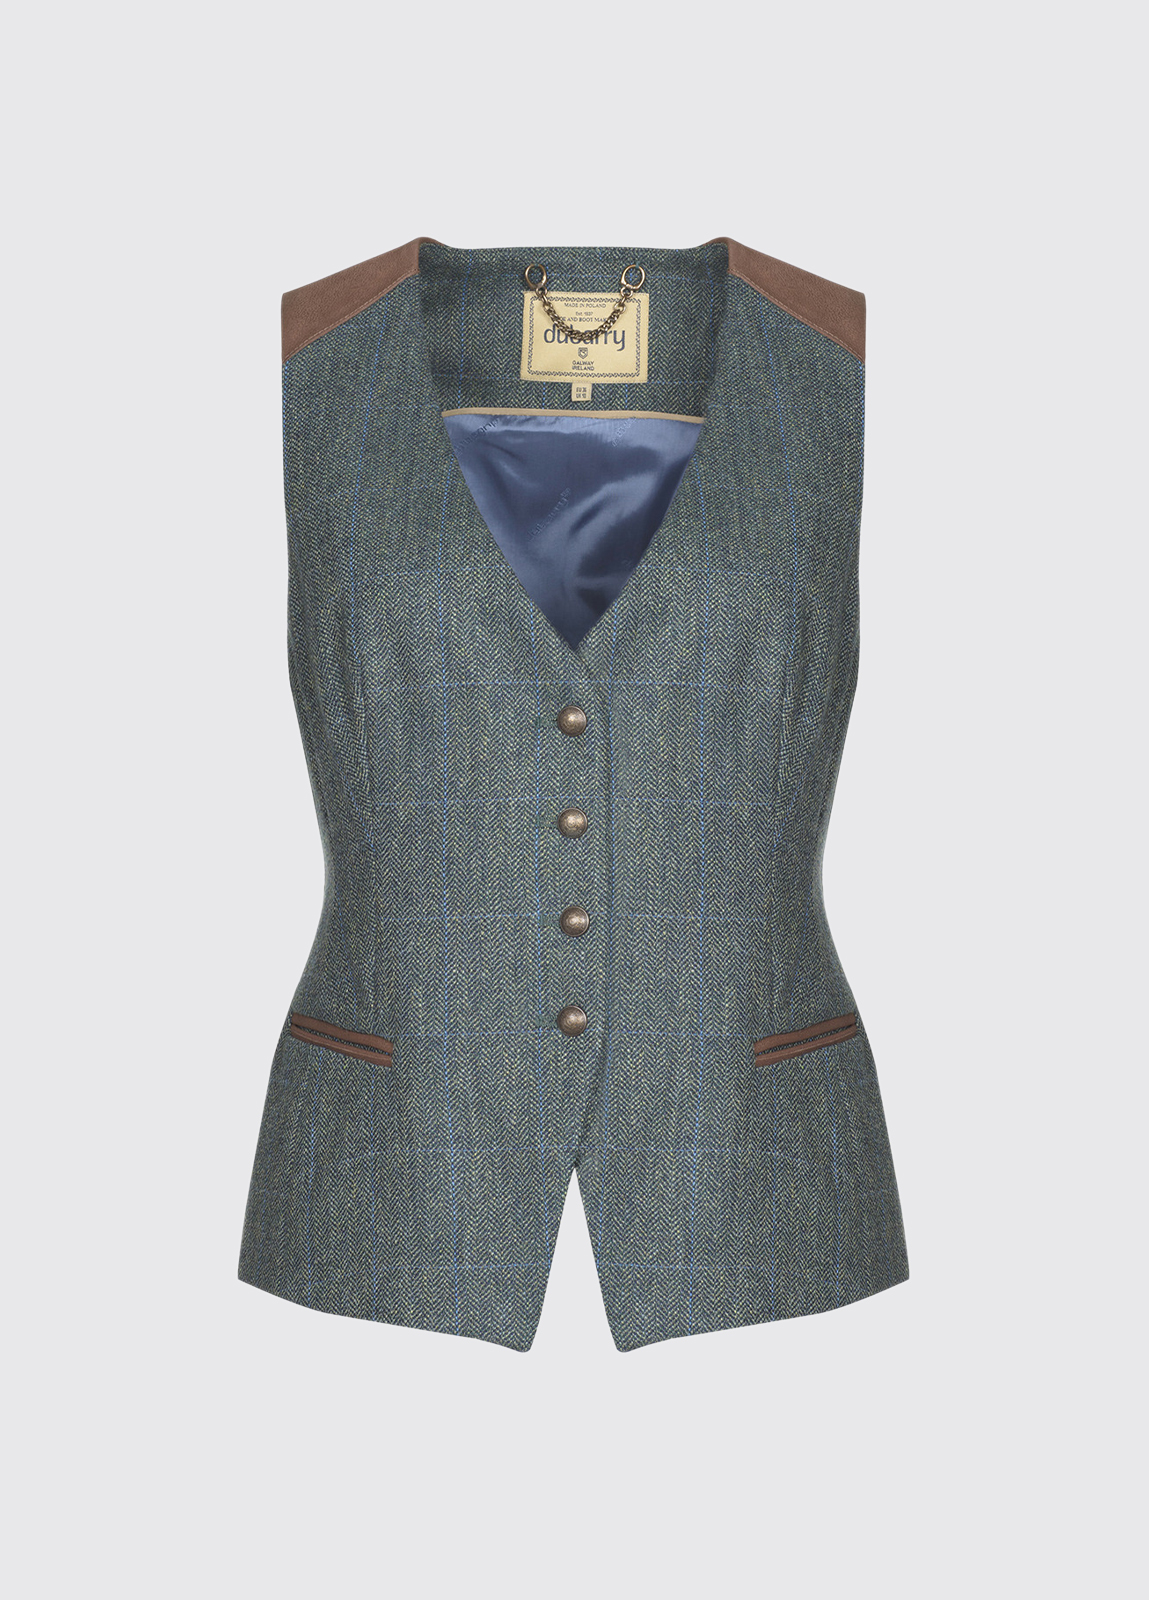 Daisy Fitted Tweed Waistcoat - Mist